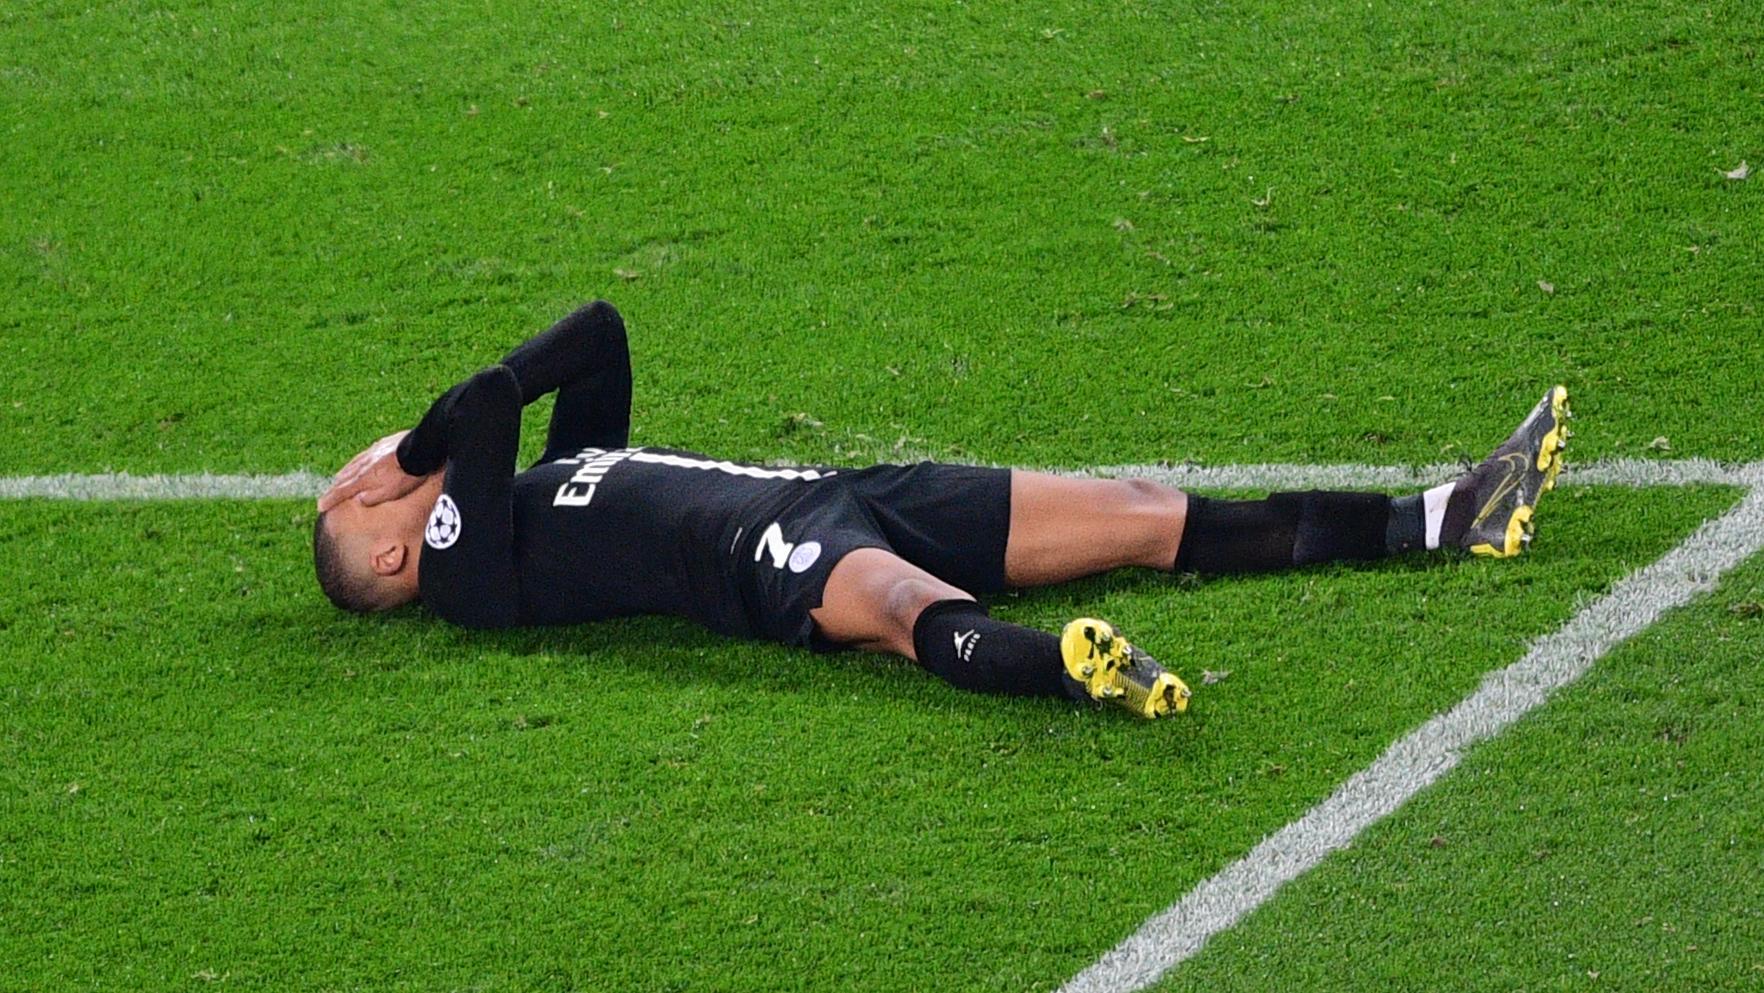 877684bb3 PSG – Manchester United: Paris Saint-Germain – klub przegranych - Liga  Mistrzów